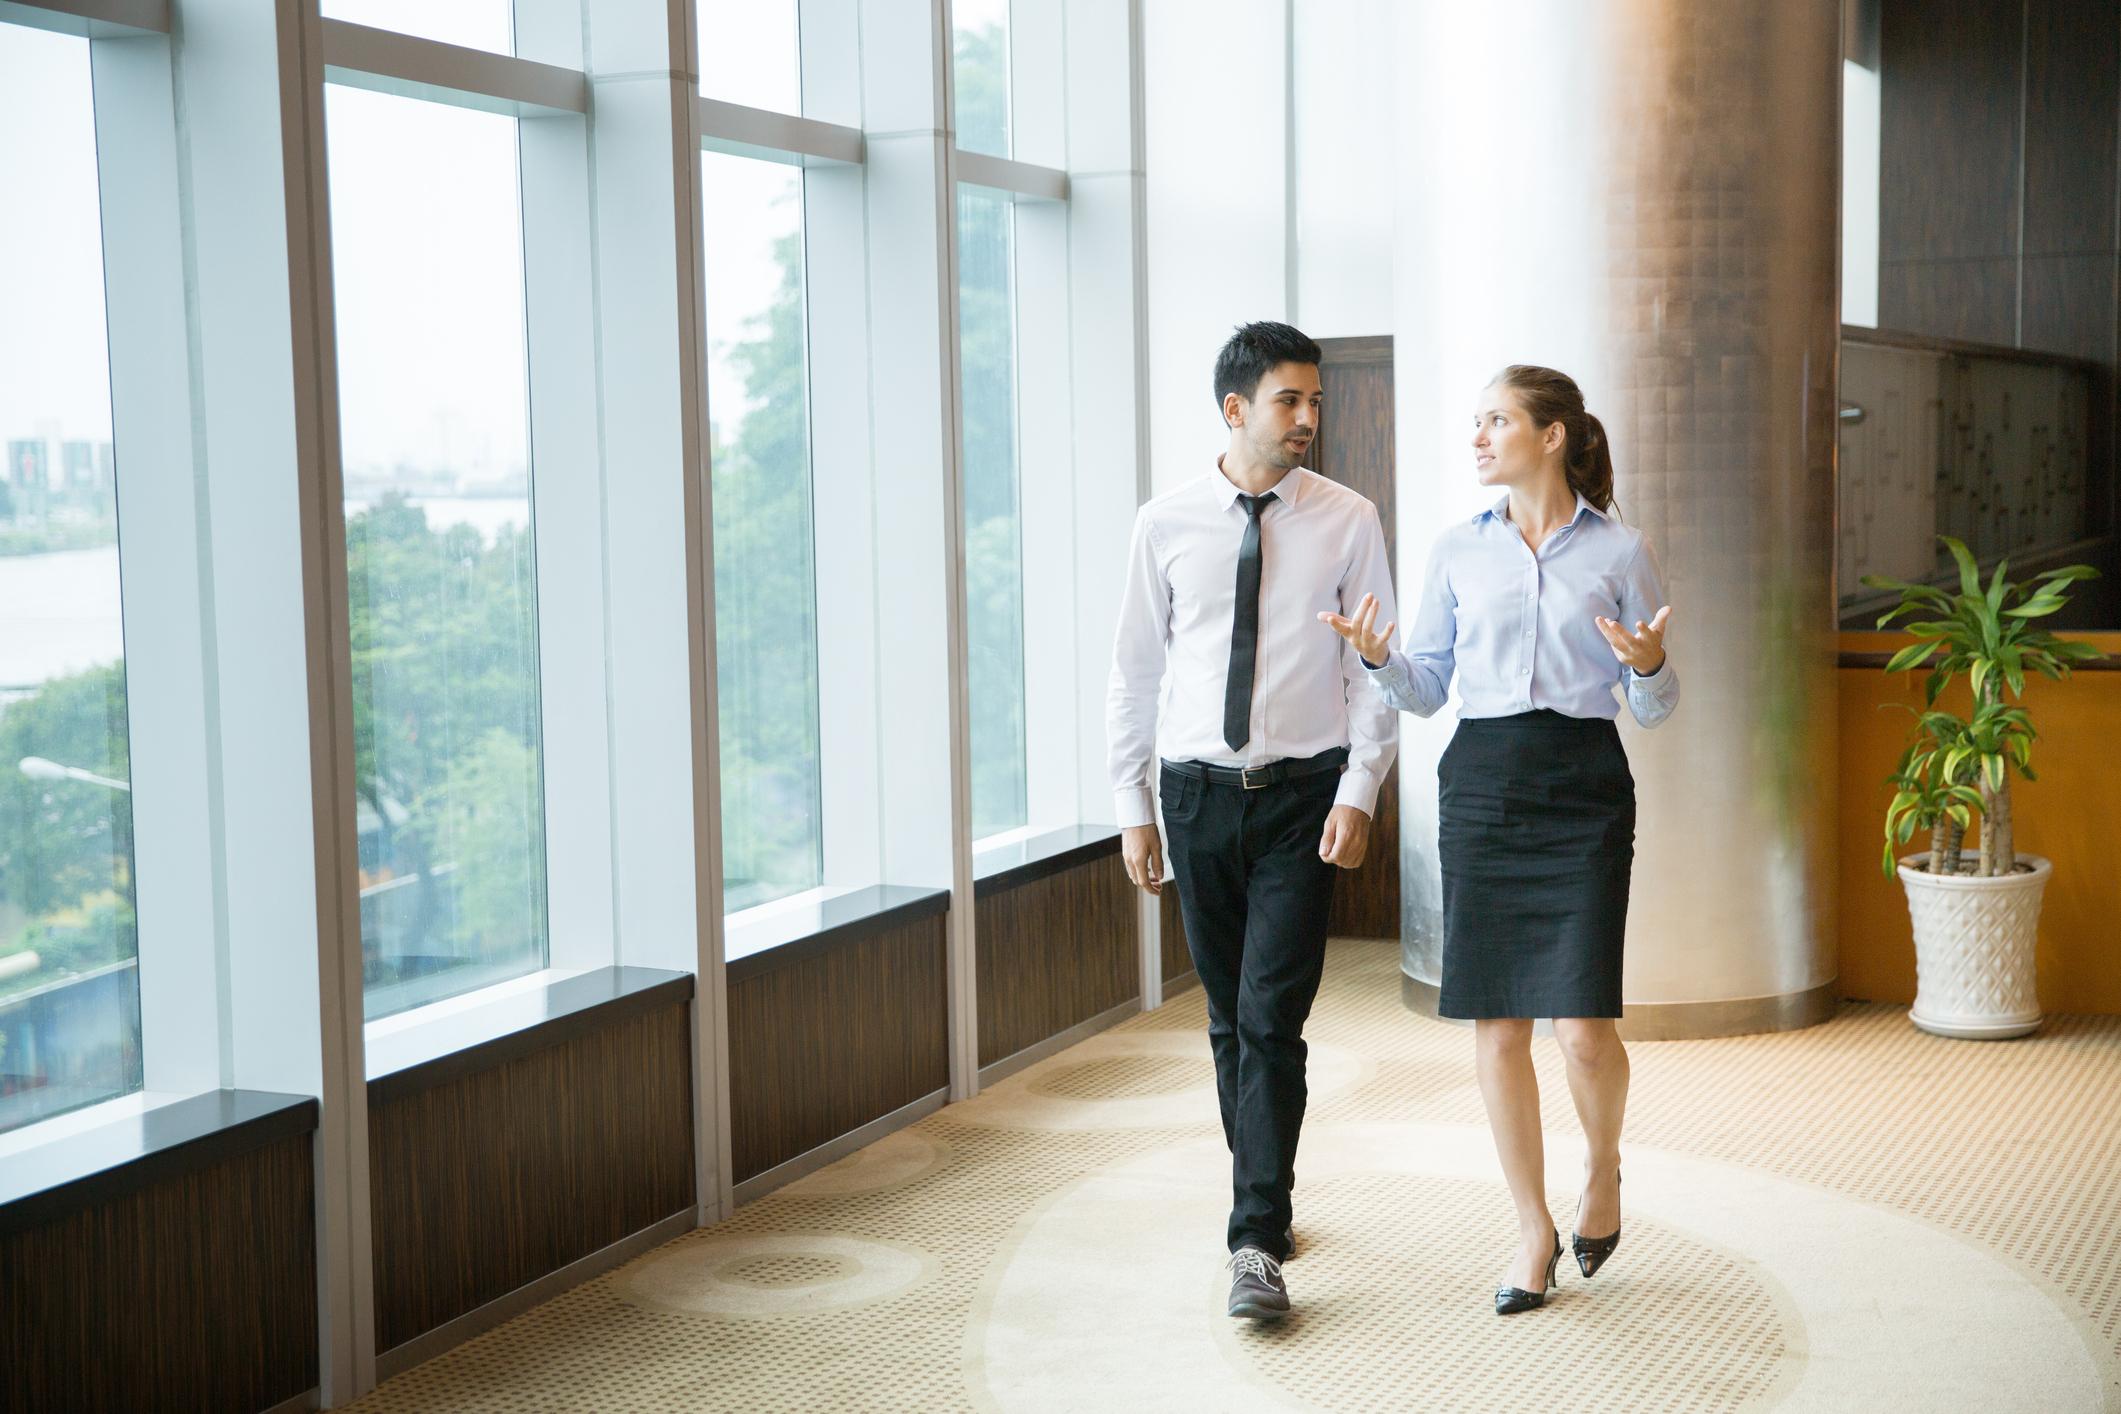 Professional man and woman talking and walking